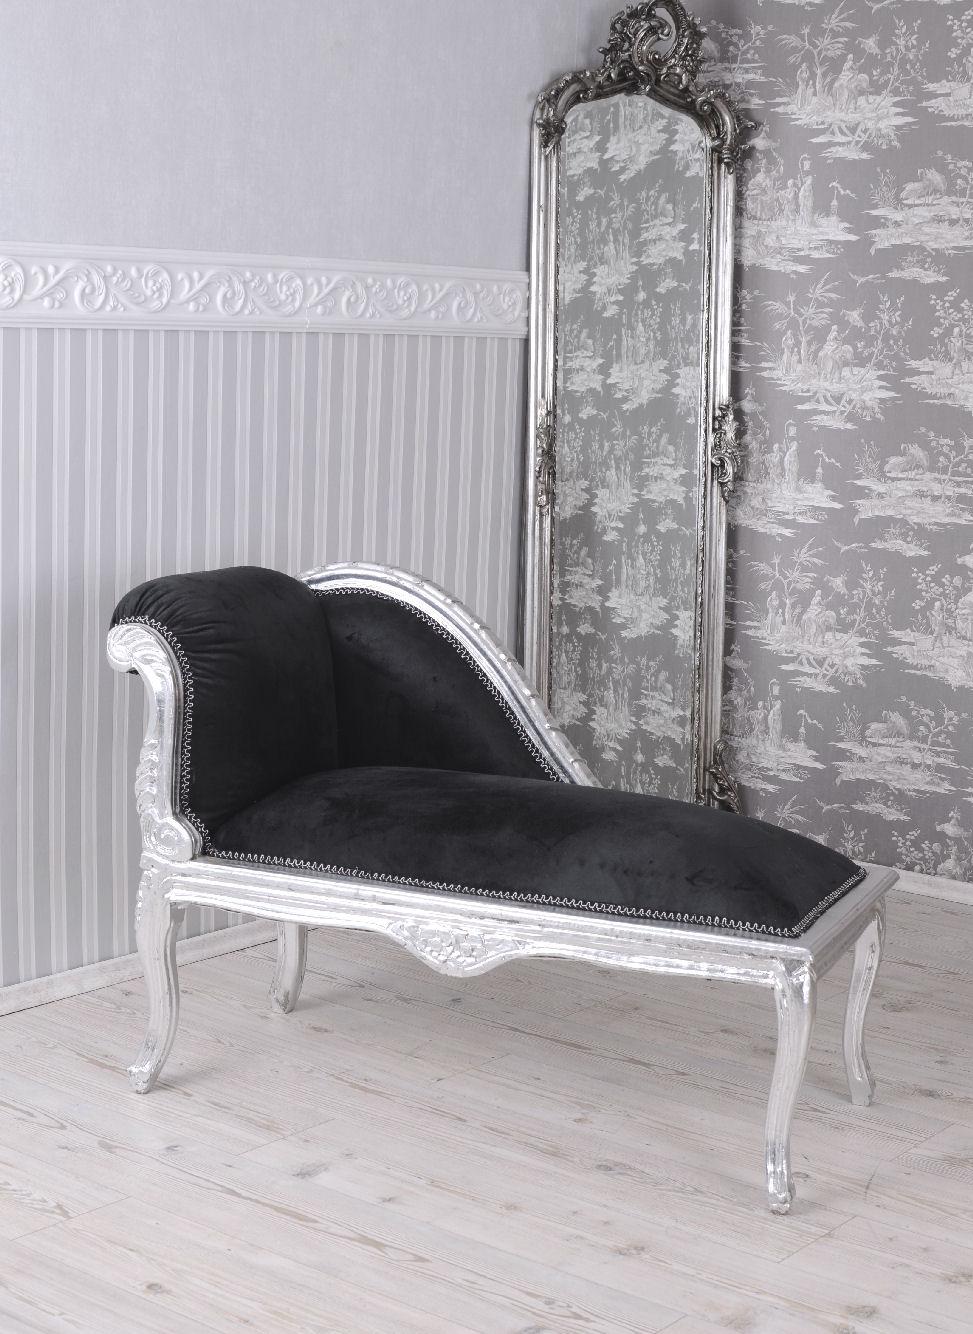 Full Size of Recamiere Barock Boudoir Chaiselongue Rot Diplomatie Rokoko Sitzbank Schwarz Sofa Ebay Bett Mit Wohnzimmer Recamiere Barock